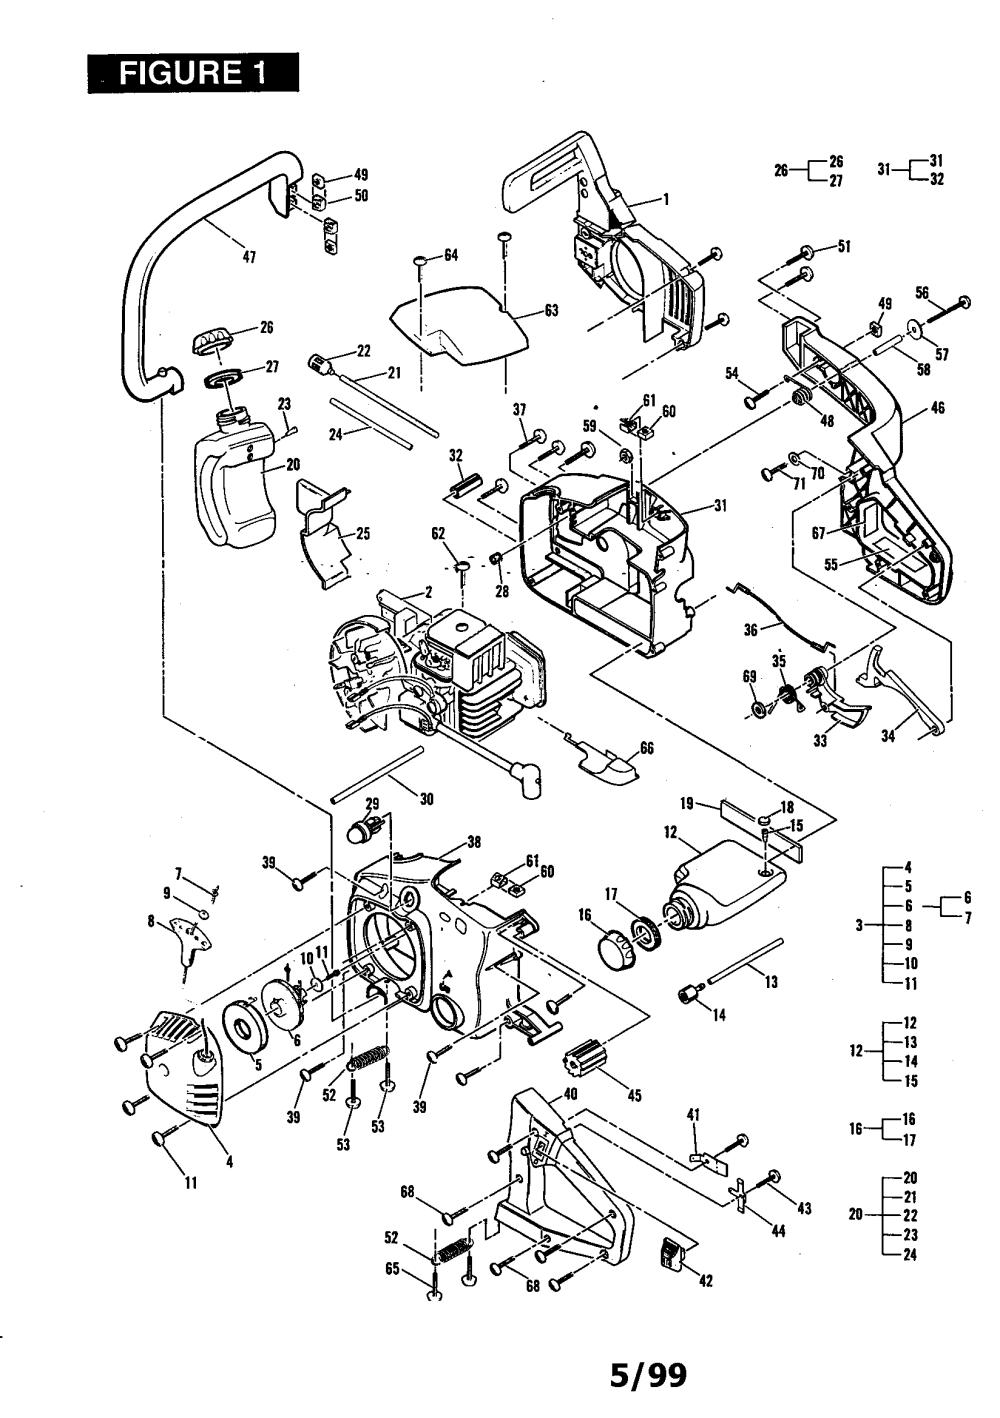 medium resolution of mcculloch mac 3516 11 600035 10 general assembly diagram